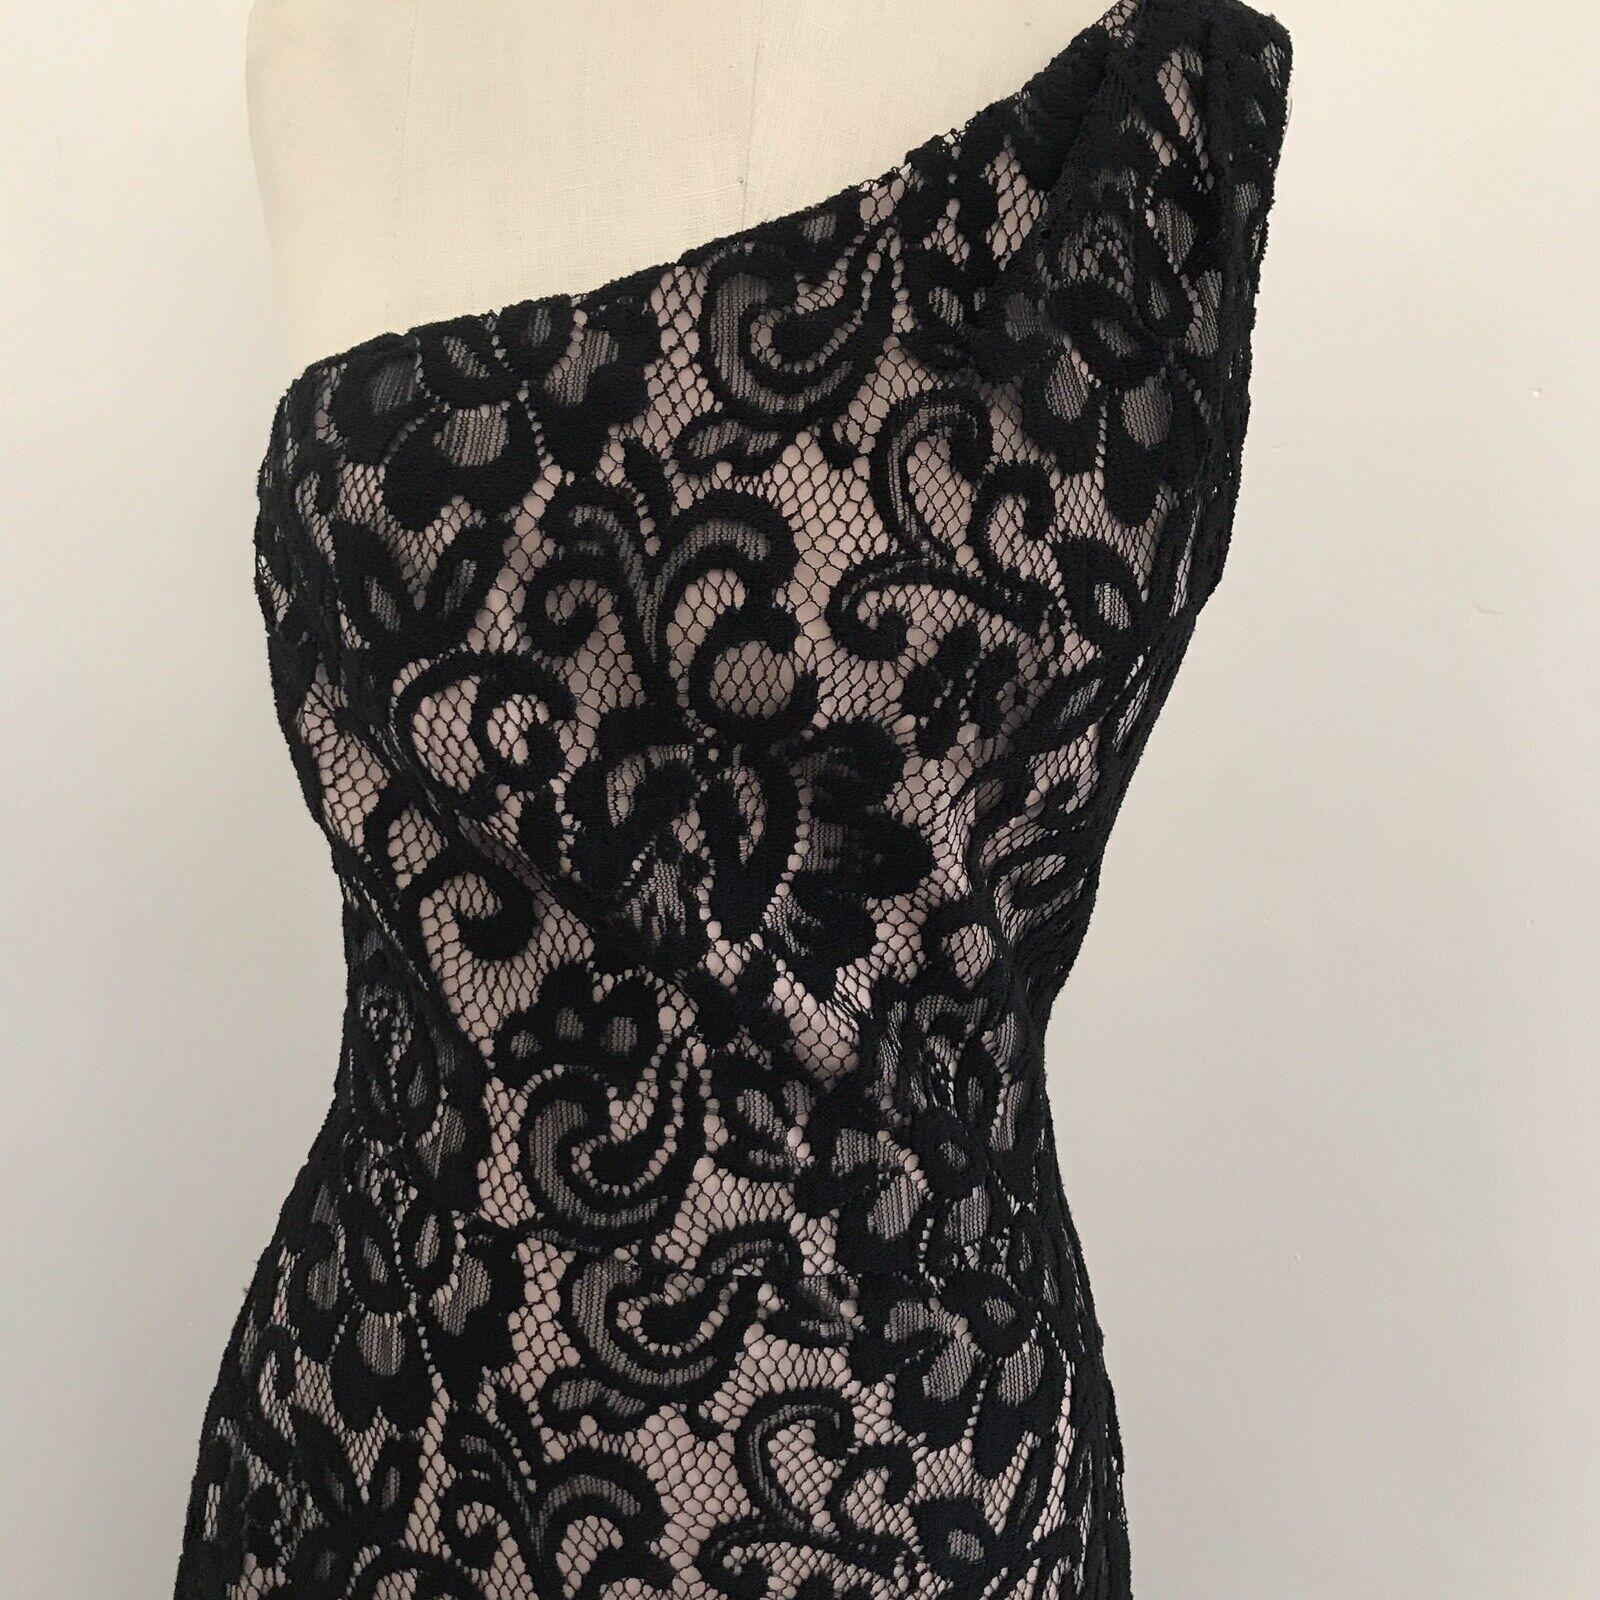 Dessy Collection Gown Black Lace One Shoulder Dre… - image 2